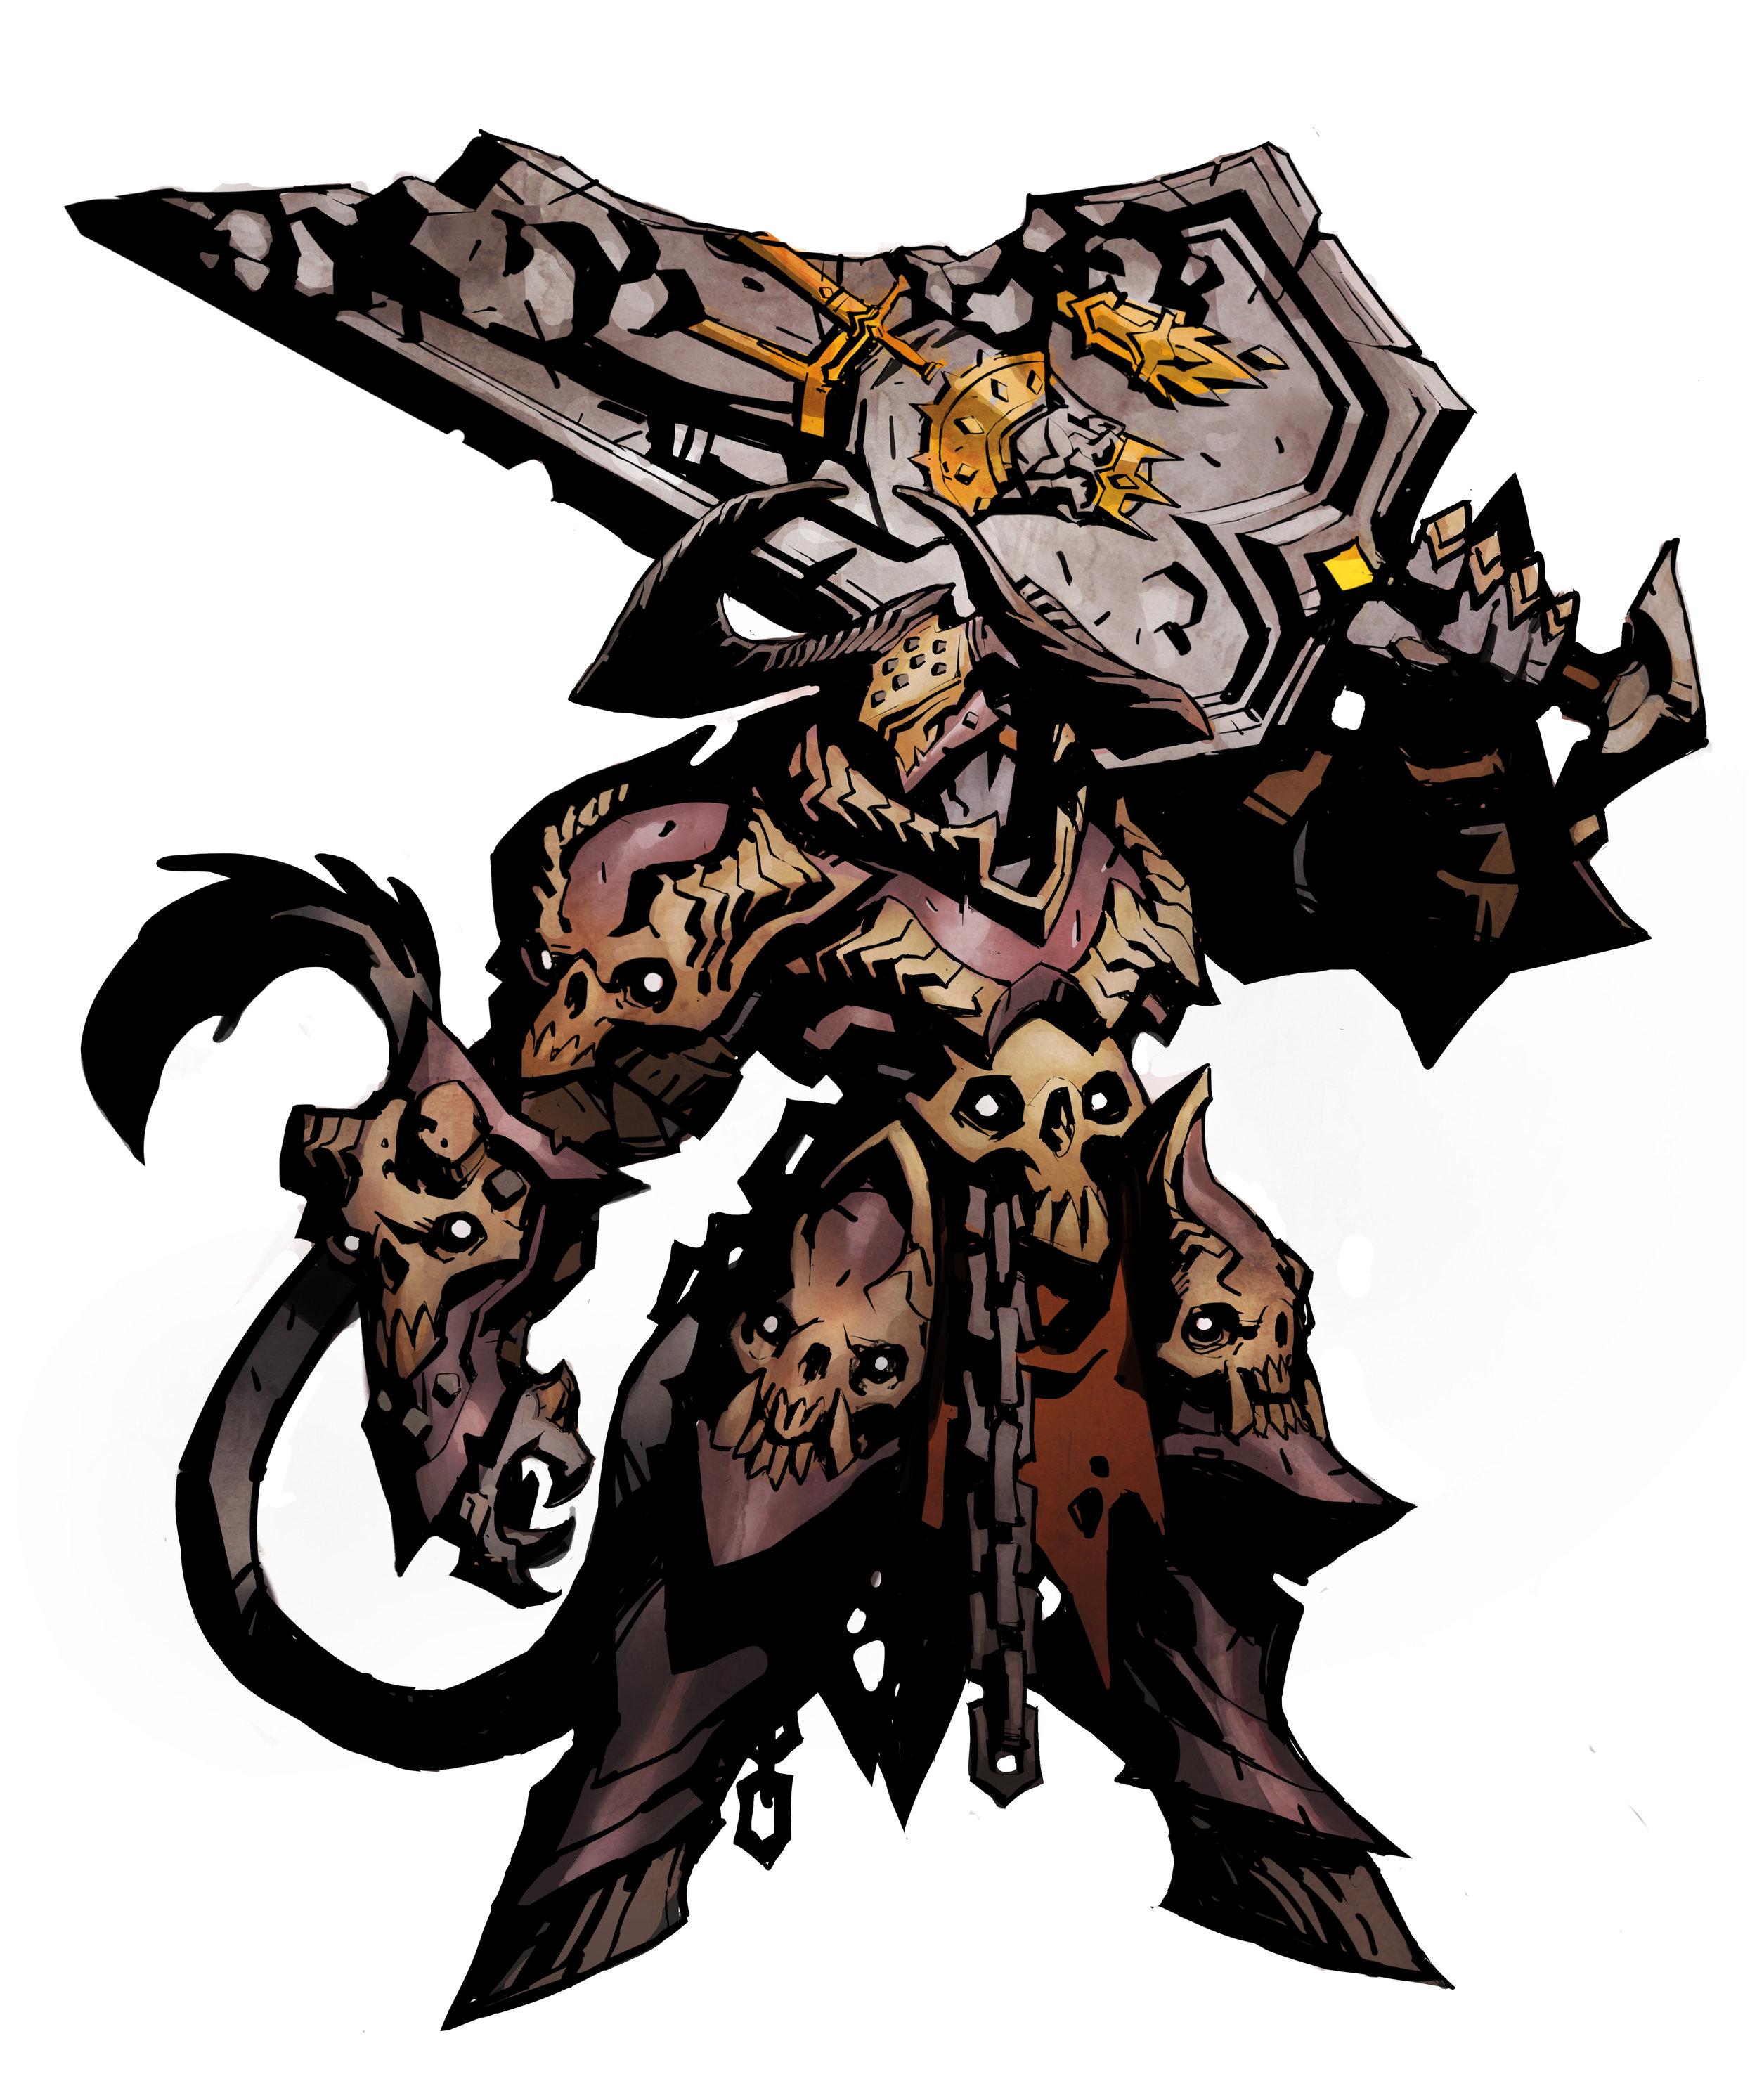 Demon_King_final.jpg